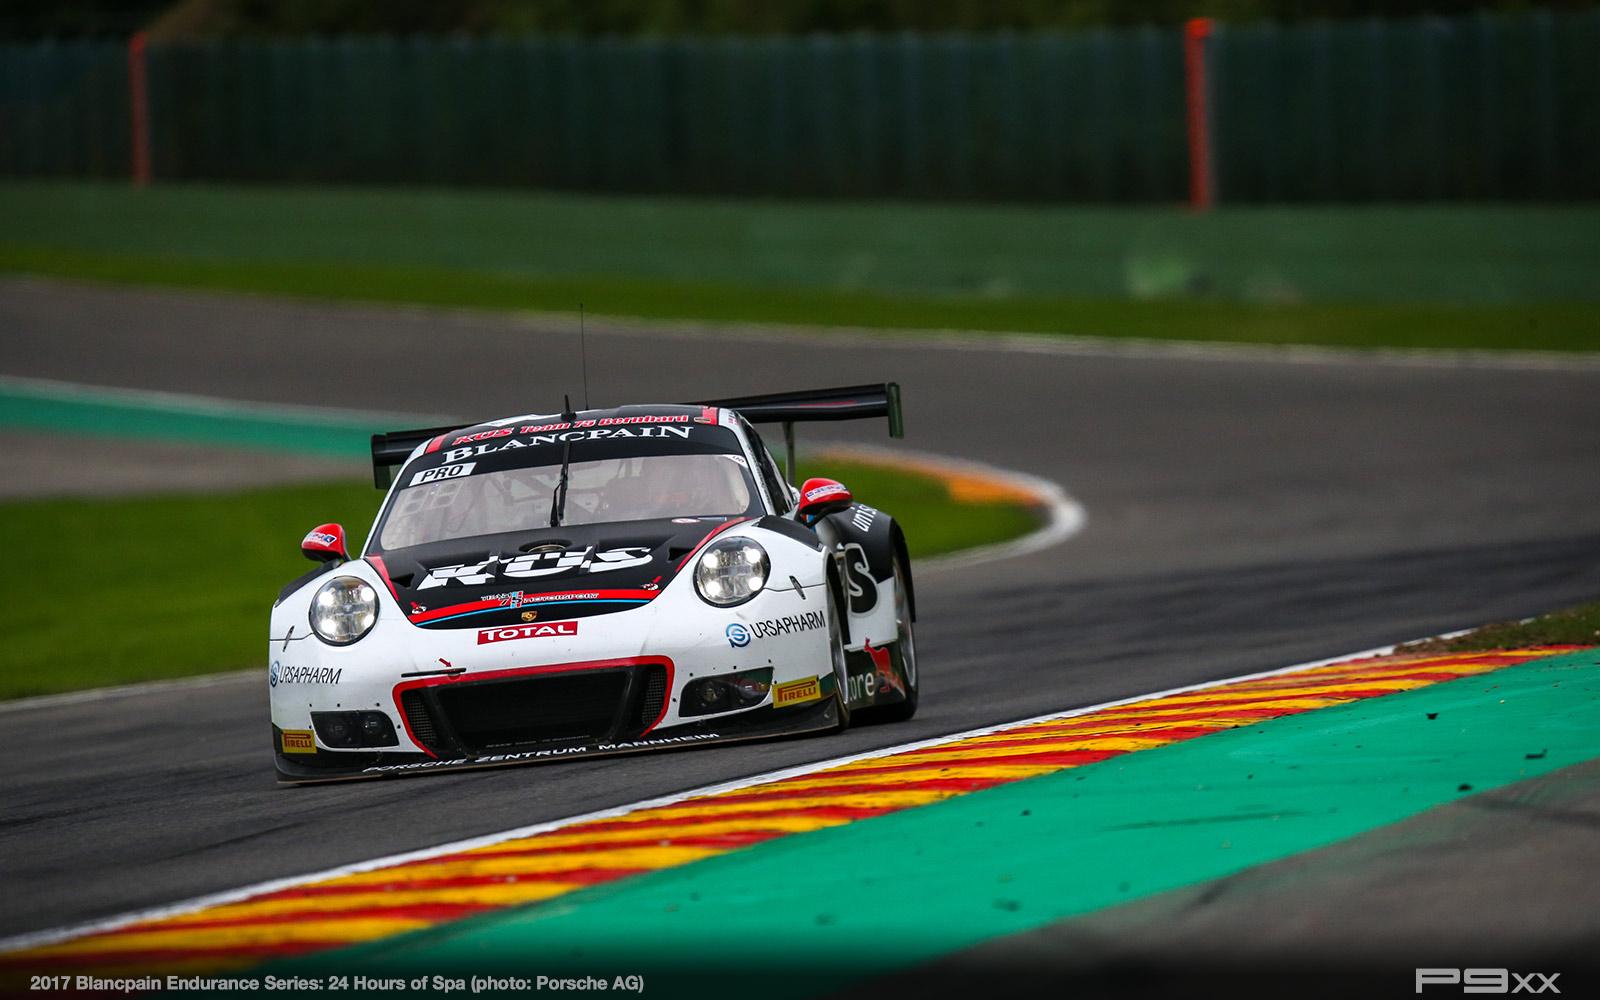 2017-24-Hours-of-Spa-Porsche-340